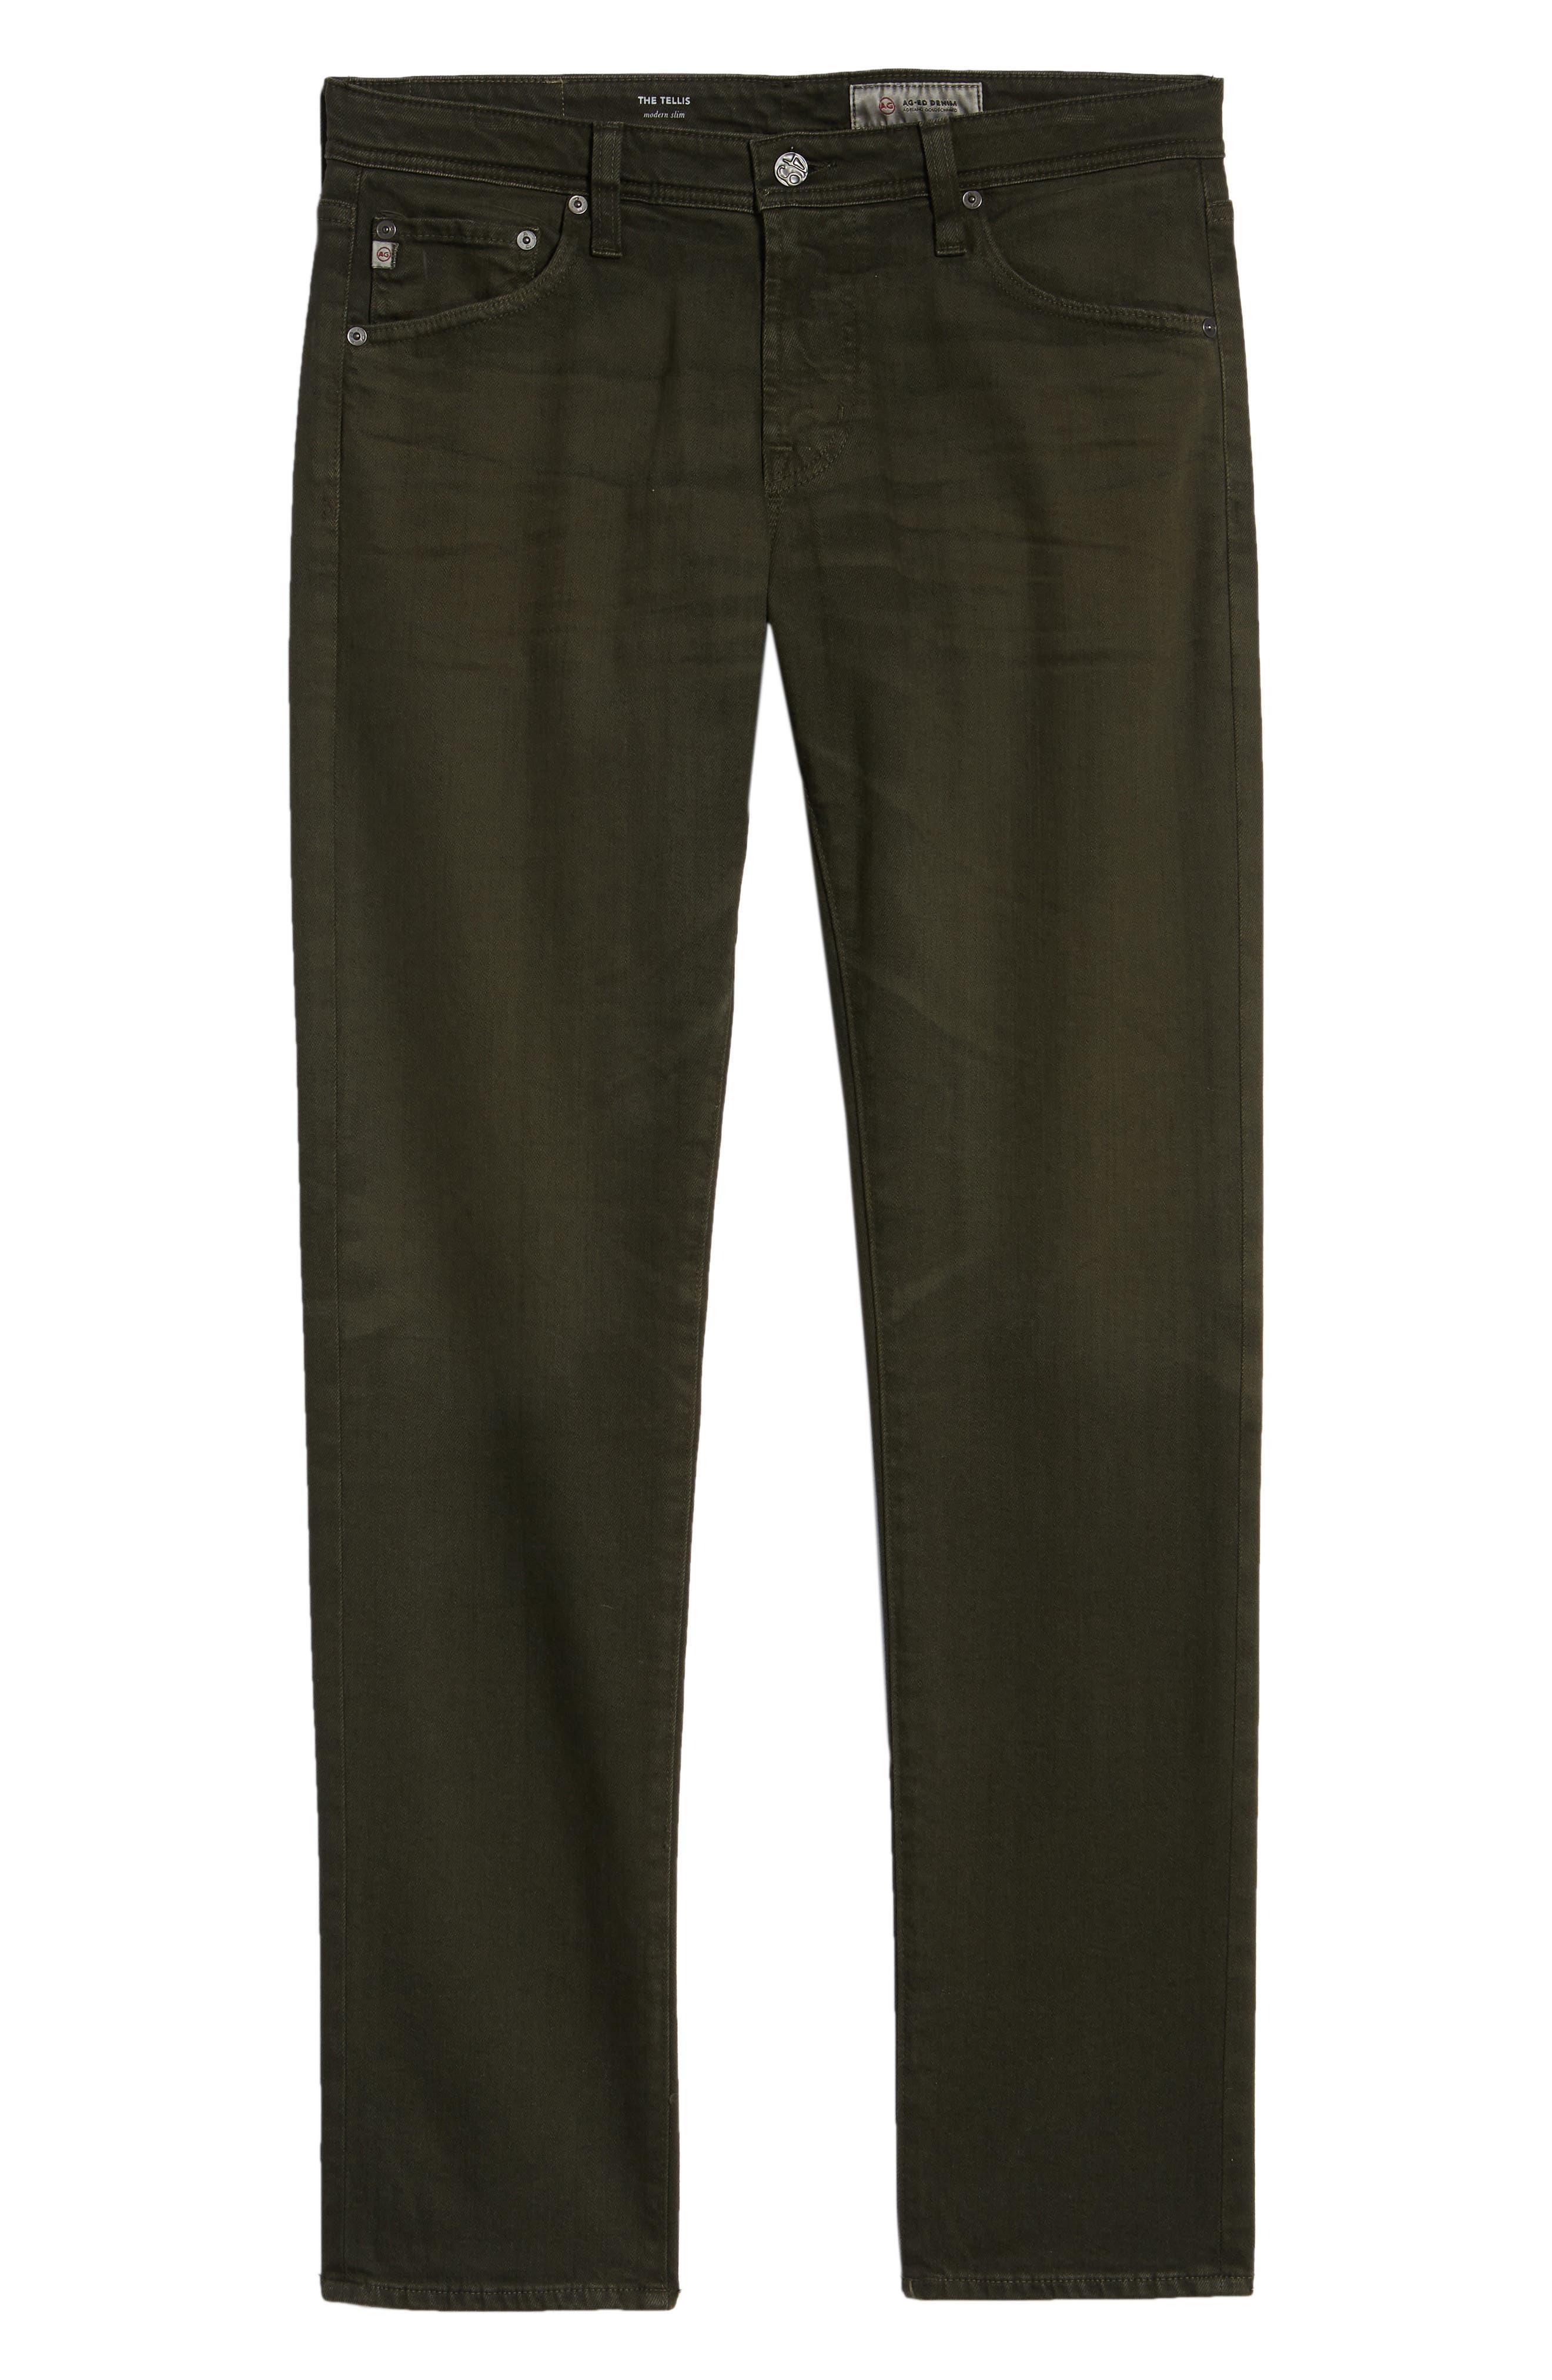 Tellis Slim Fit Jeans,                             Alternate thumbnail 6, color,                             7 YEARS OAK GROVE